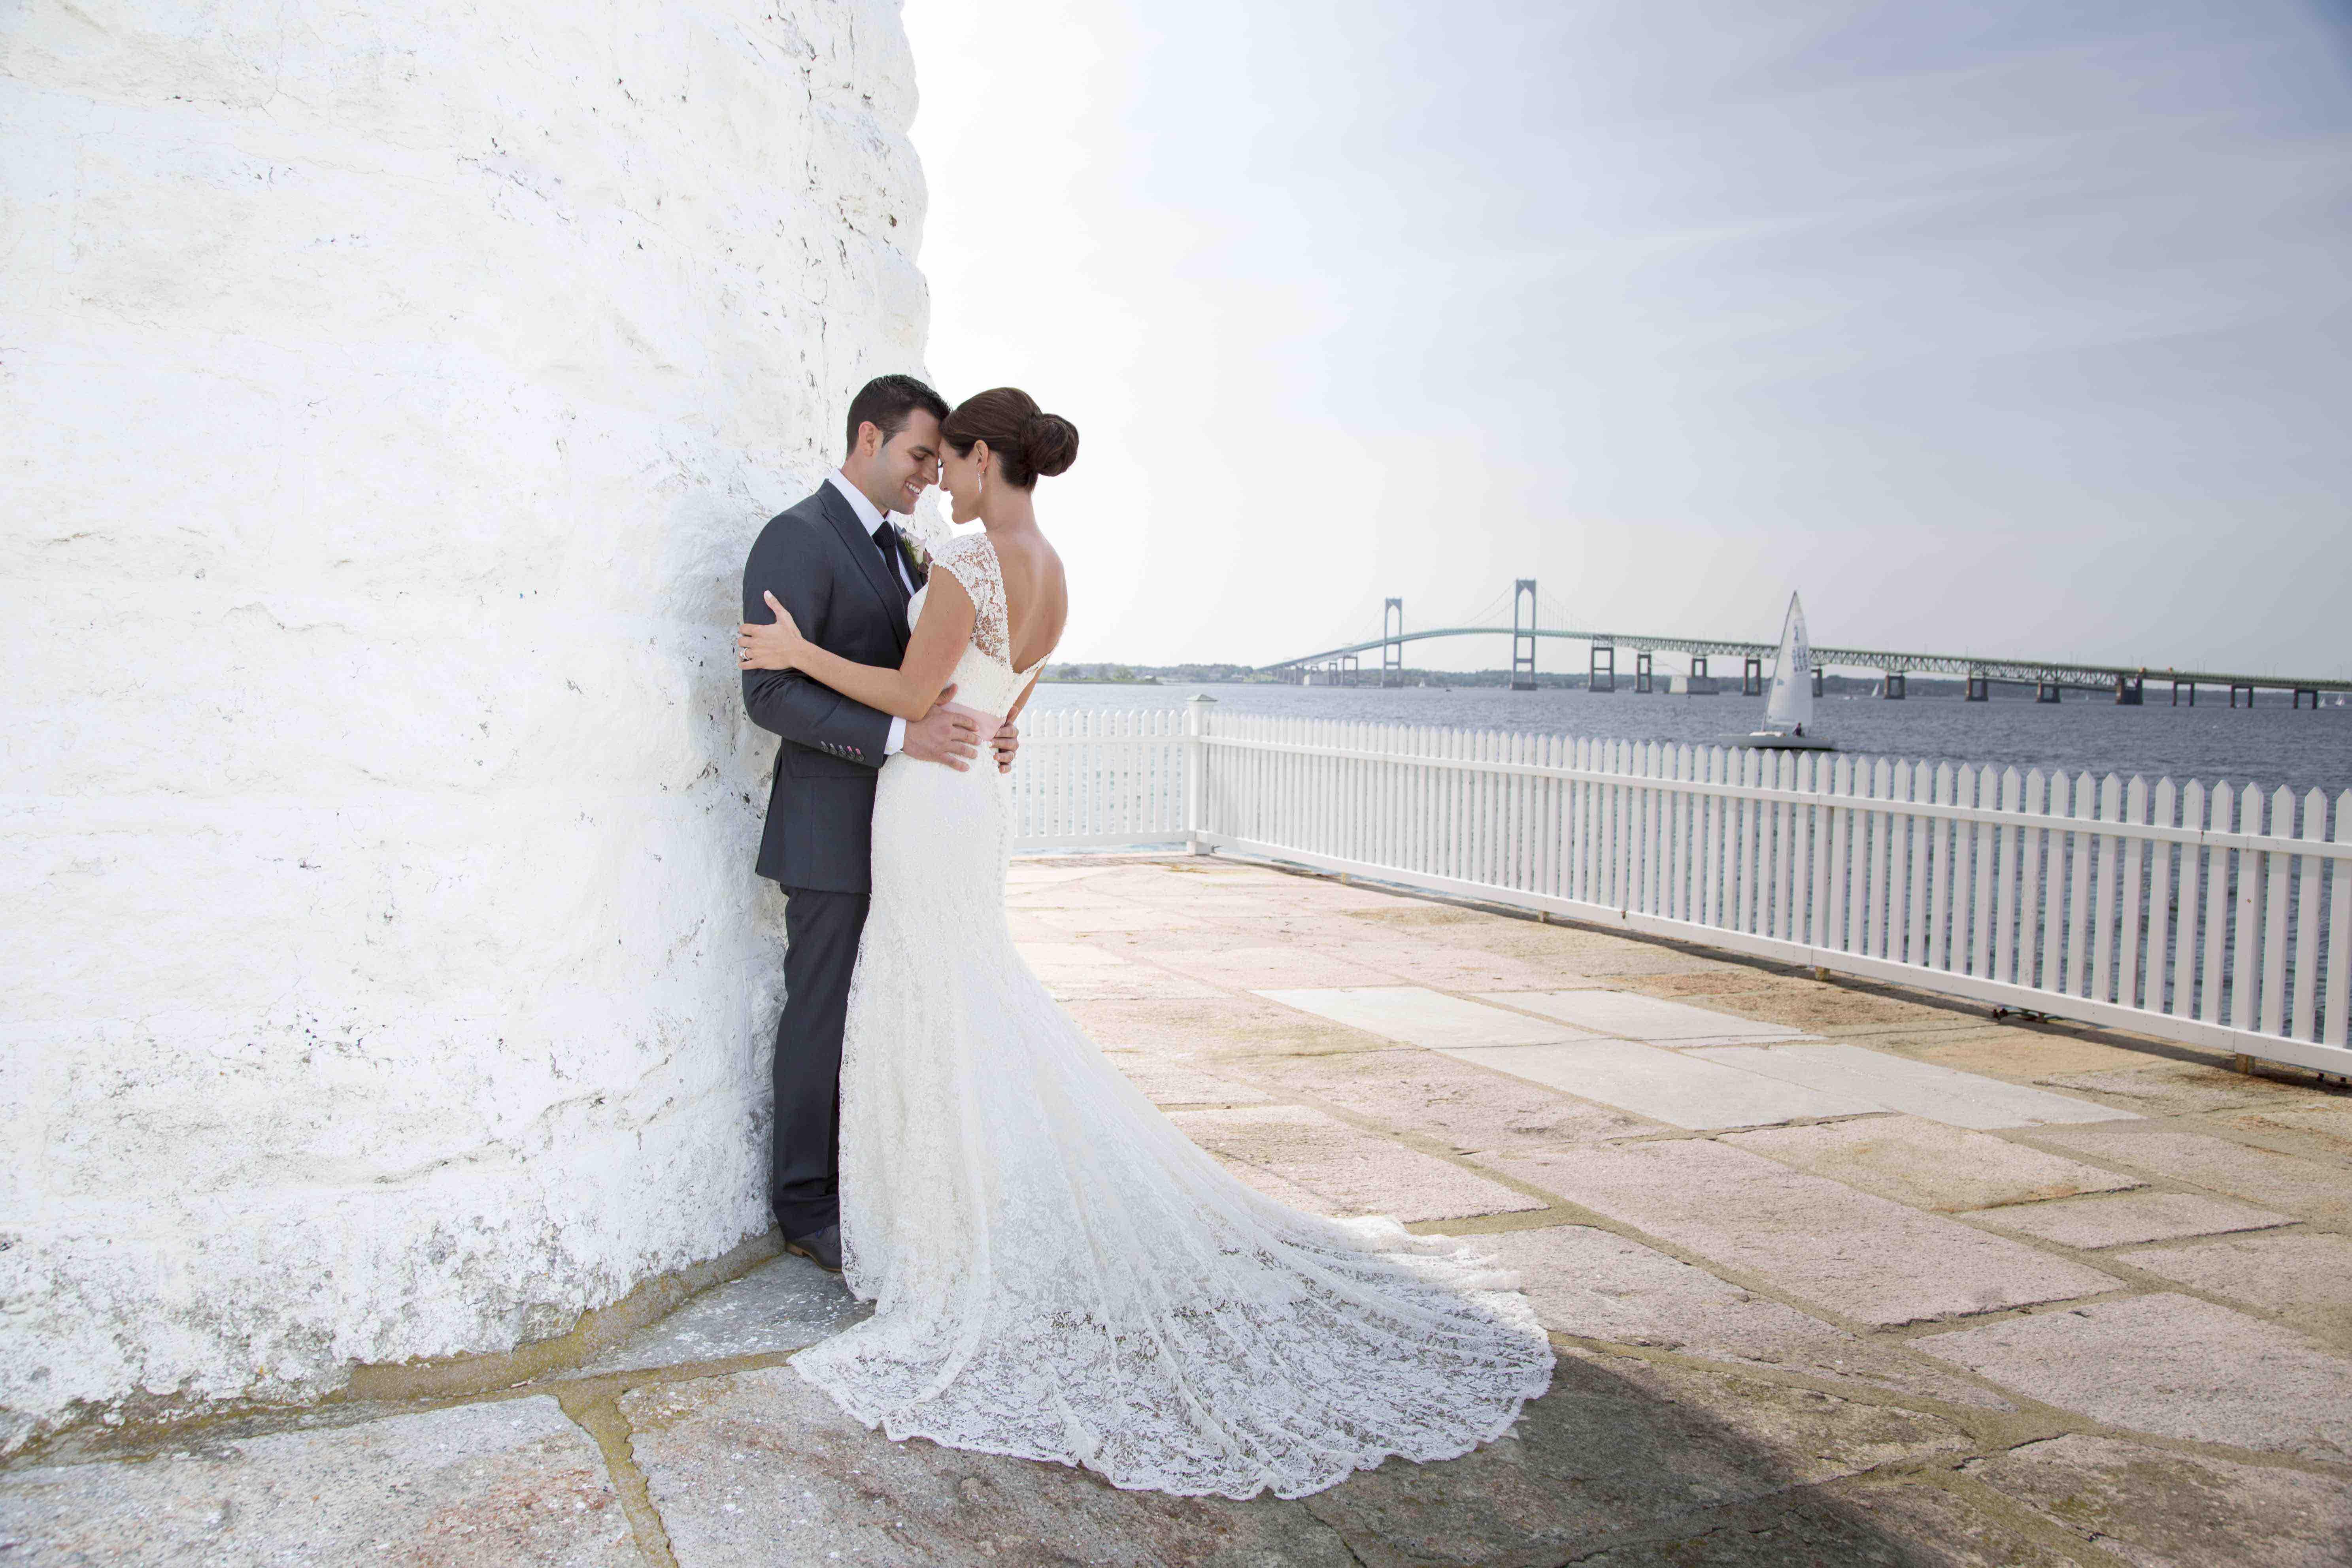 Anna Post on Etiquette Wedding Planning Tips Inside Weddings